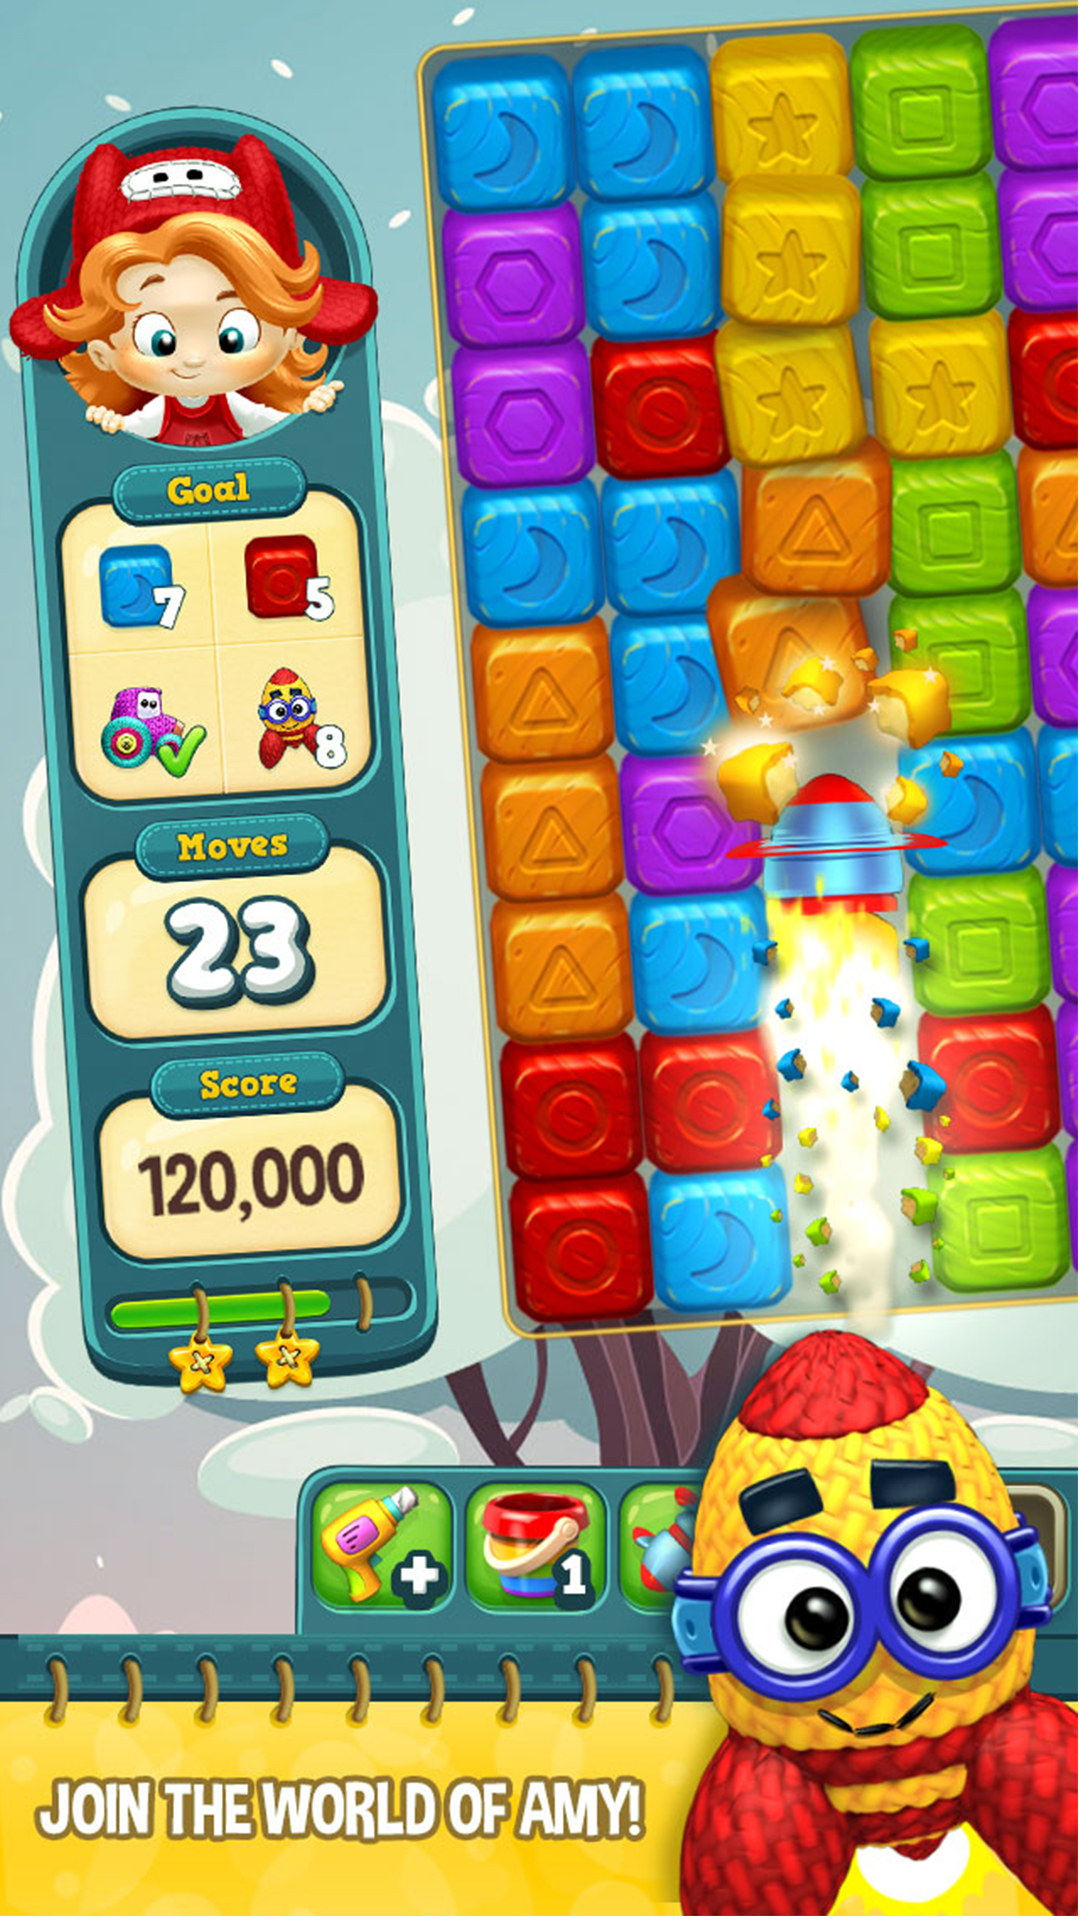 Toy Blast Kindle : Toy blast amazon appstore